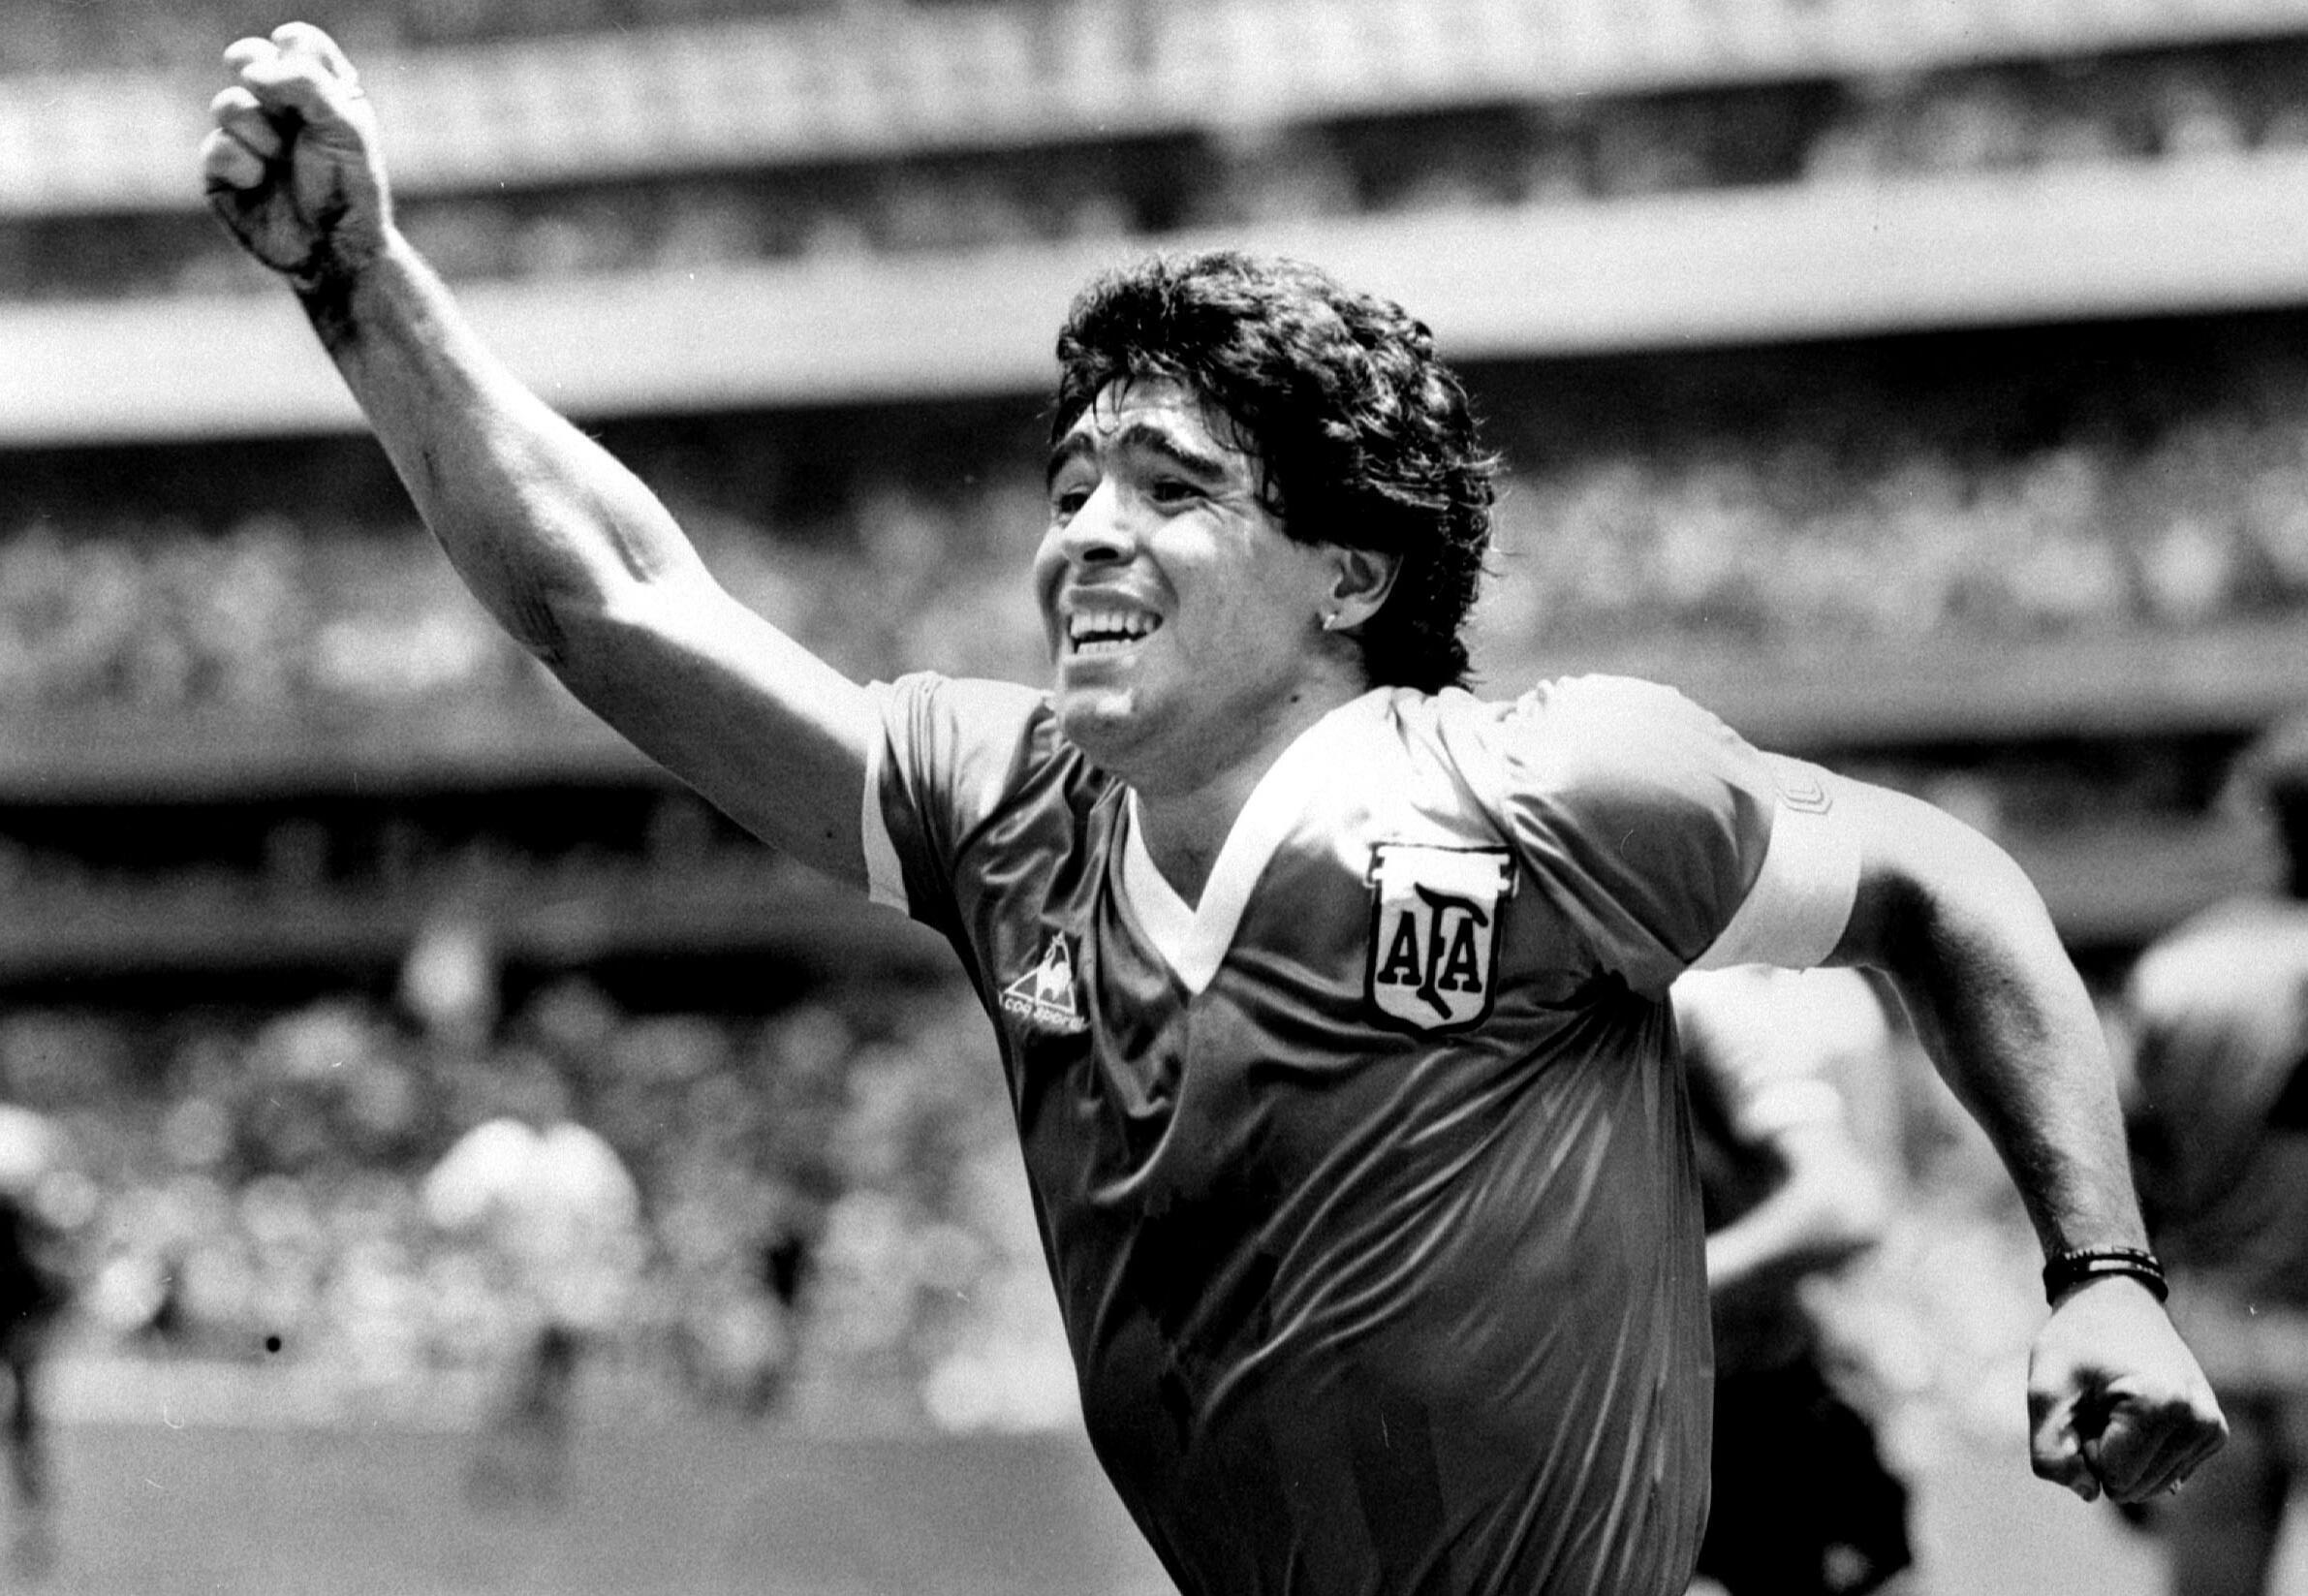 2020-11-25 argentina football diego Maradona sport world cup mexico england 1986